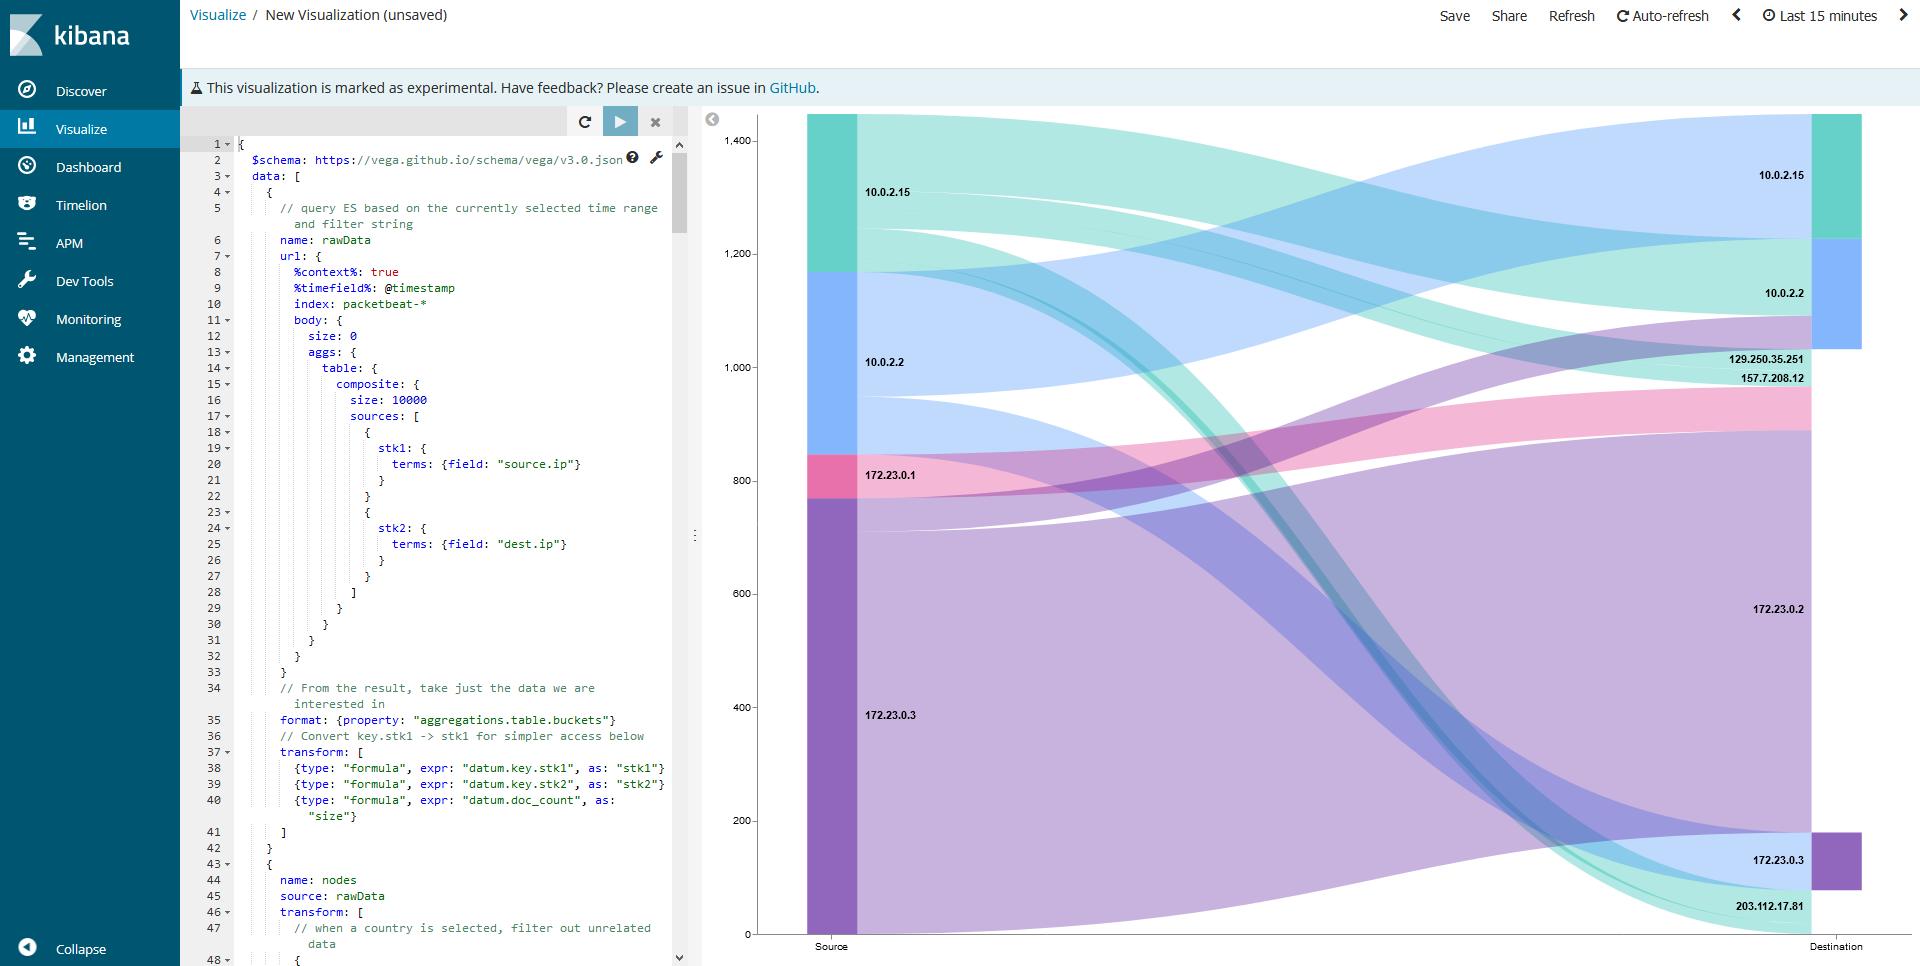 PacketbeatのFlow情報をSankey Diagramで可視化する(Kibana6 2+